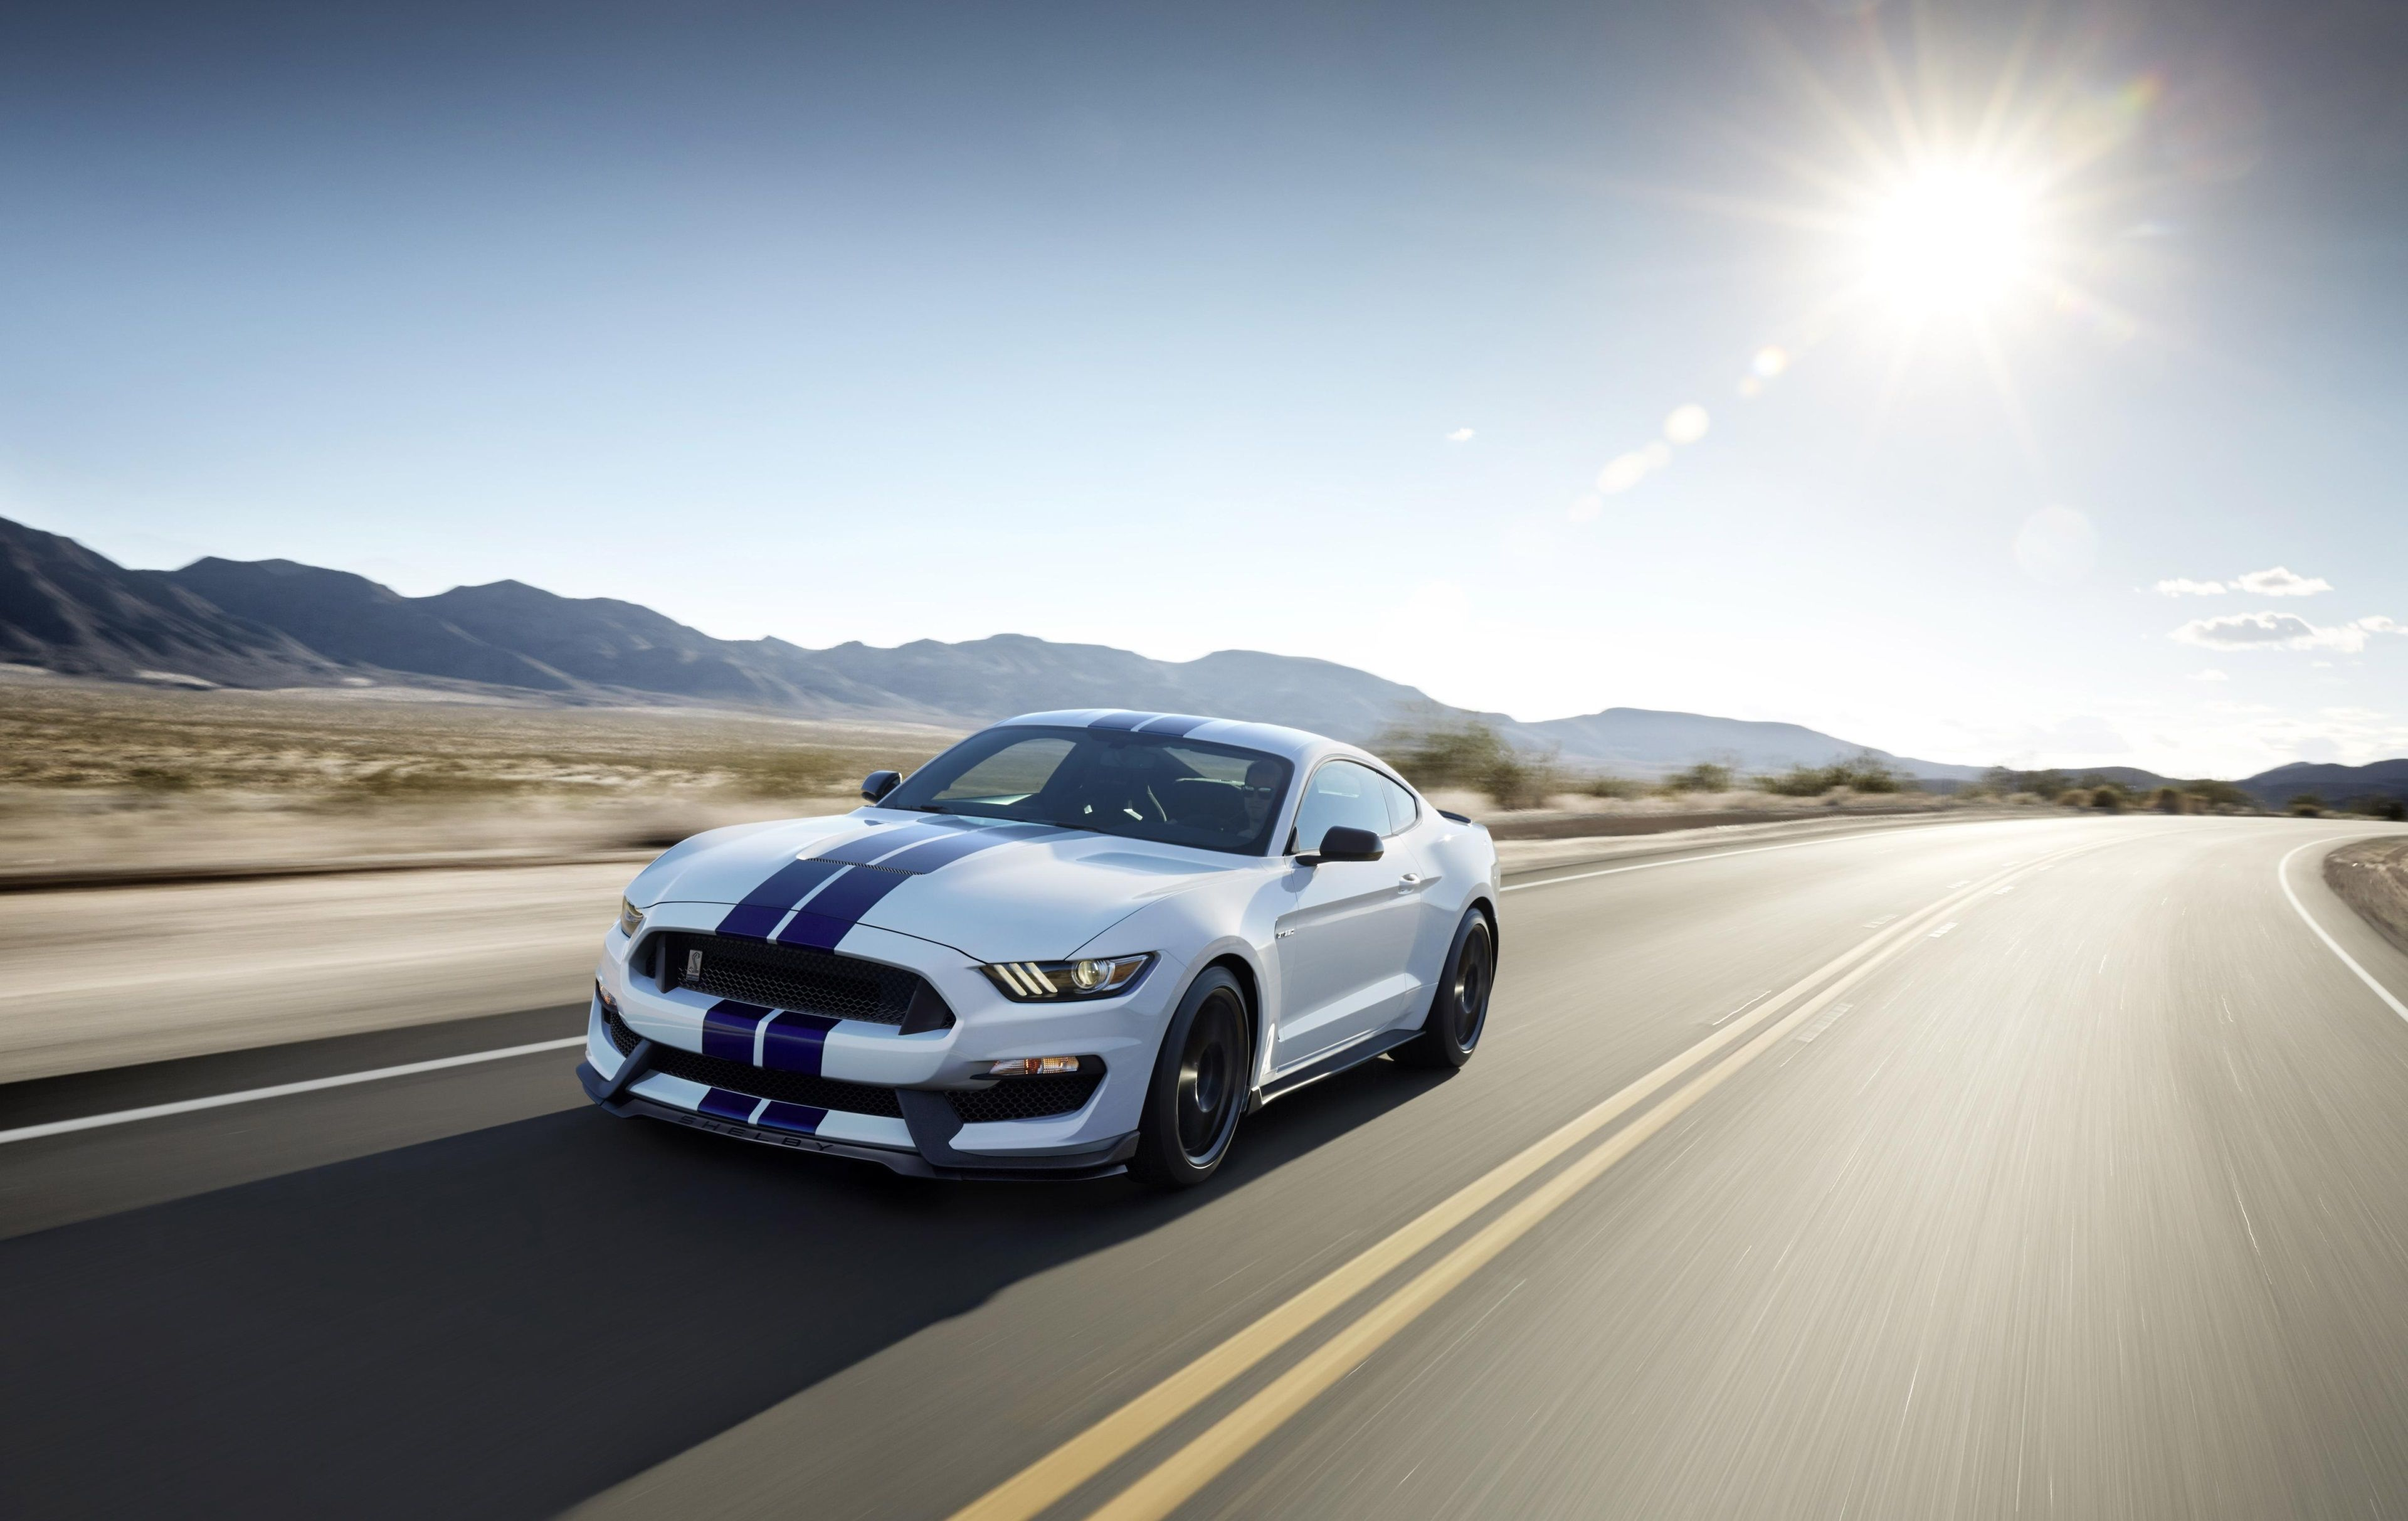 Popular Wallpaper High Quality Mustang - 88584f4cadead02c27ad42702f76d1b2  HD_409823.jpg